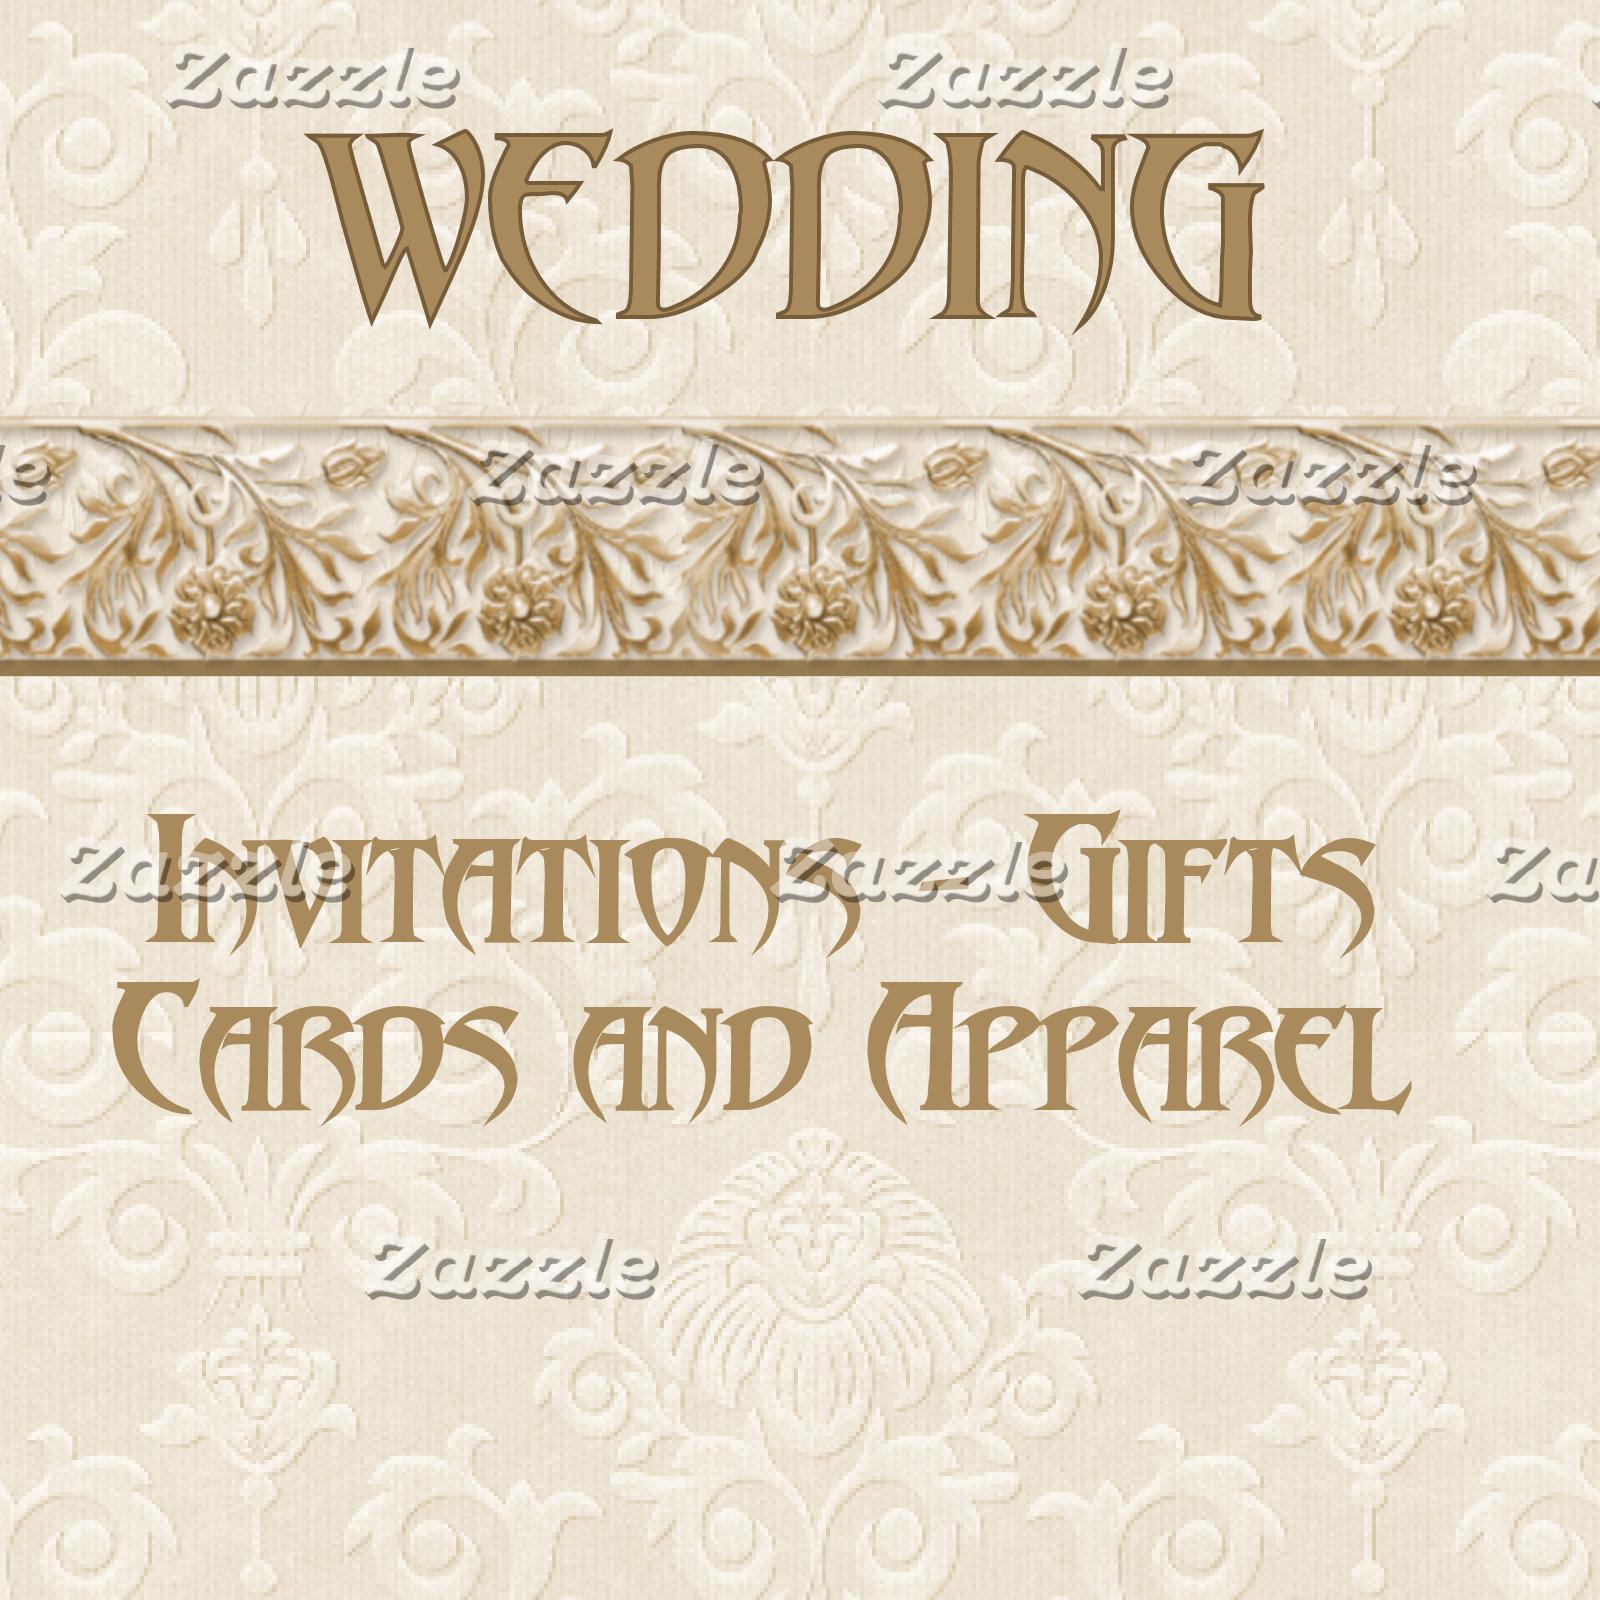 1. WEDDING